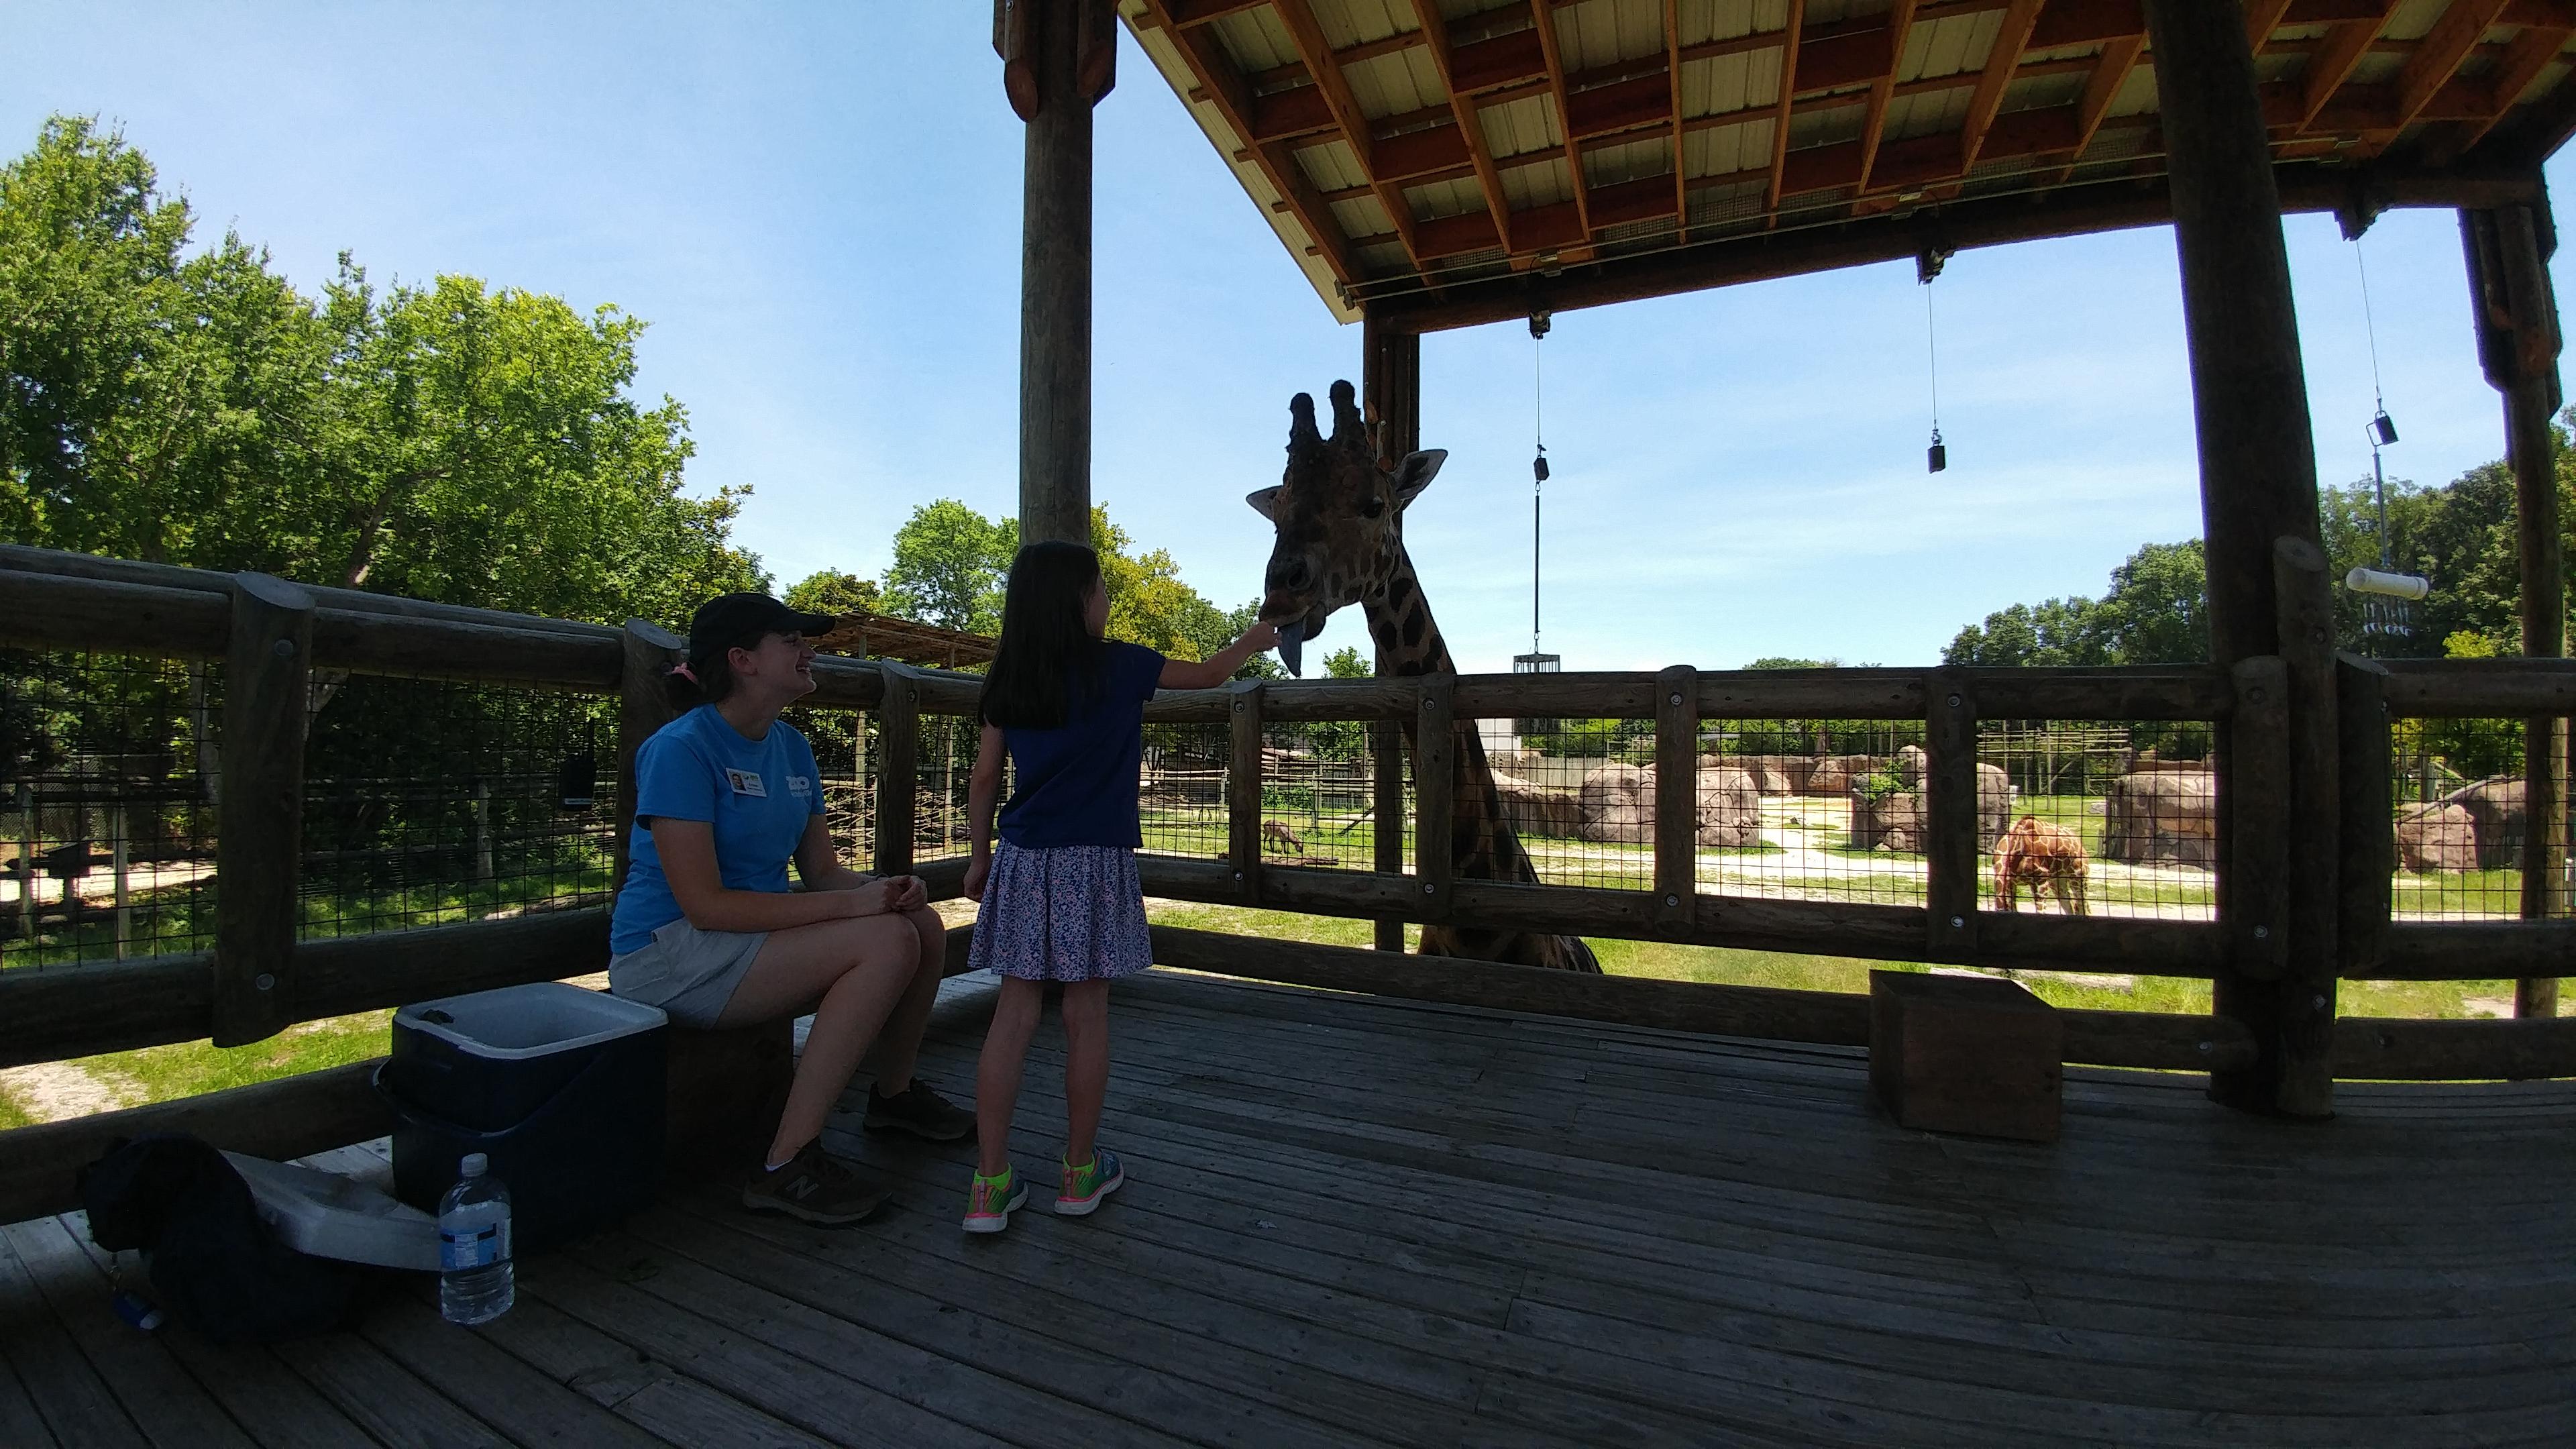 Girl feeds giraffe at the zoo